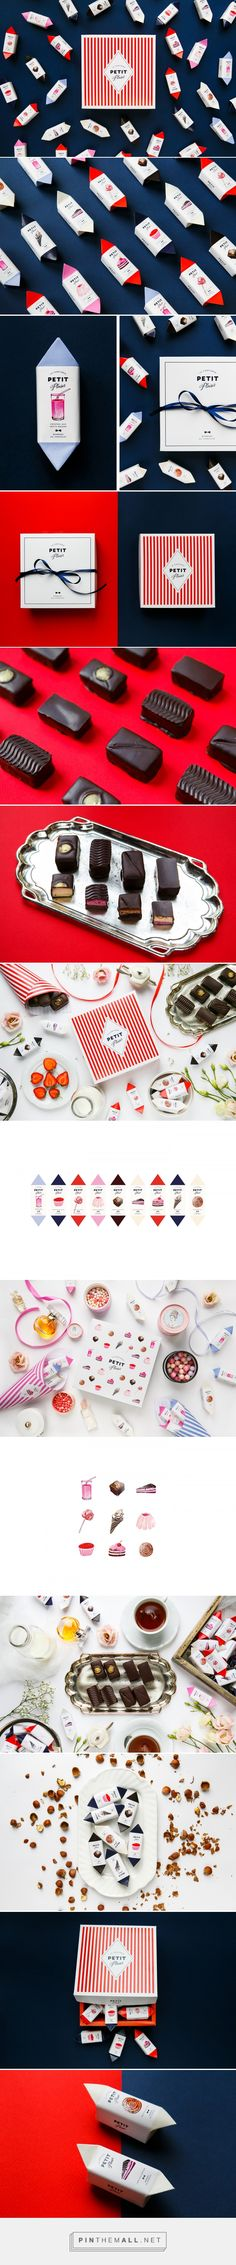 Petit Plaisir Chocolates packaging design by Loco Studio - http://www.packagingoftheworld.com/2016/10/petit-plaisir-chocolates.html